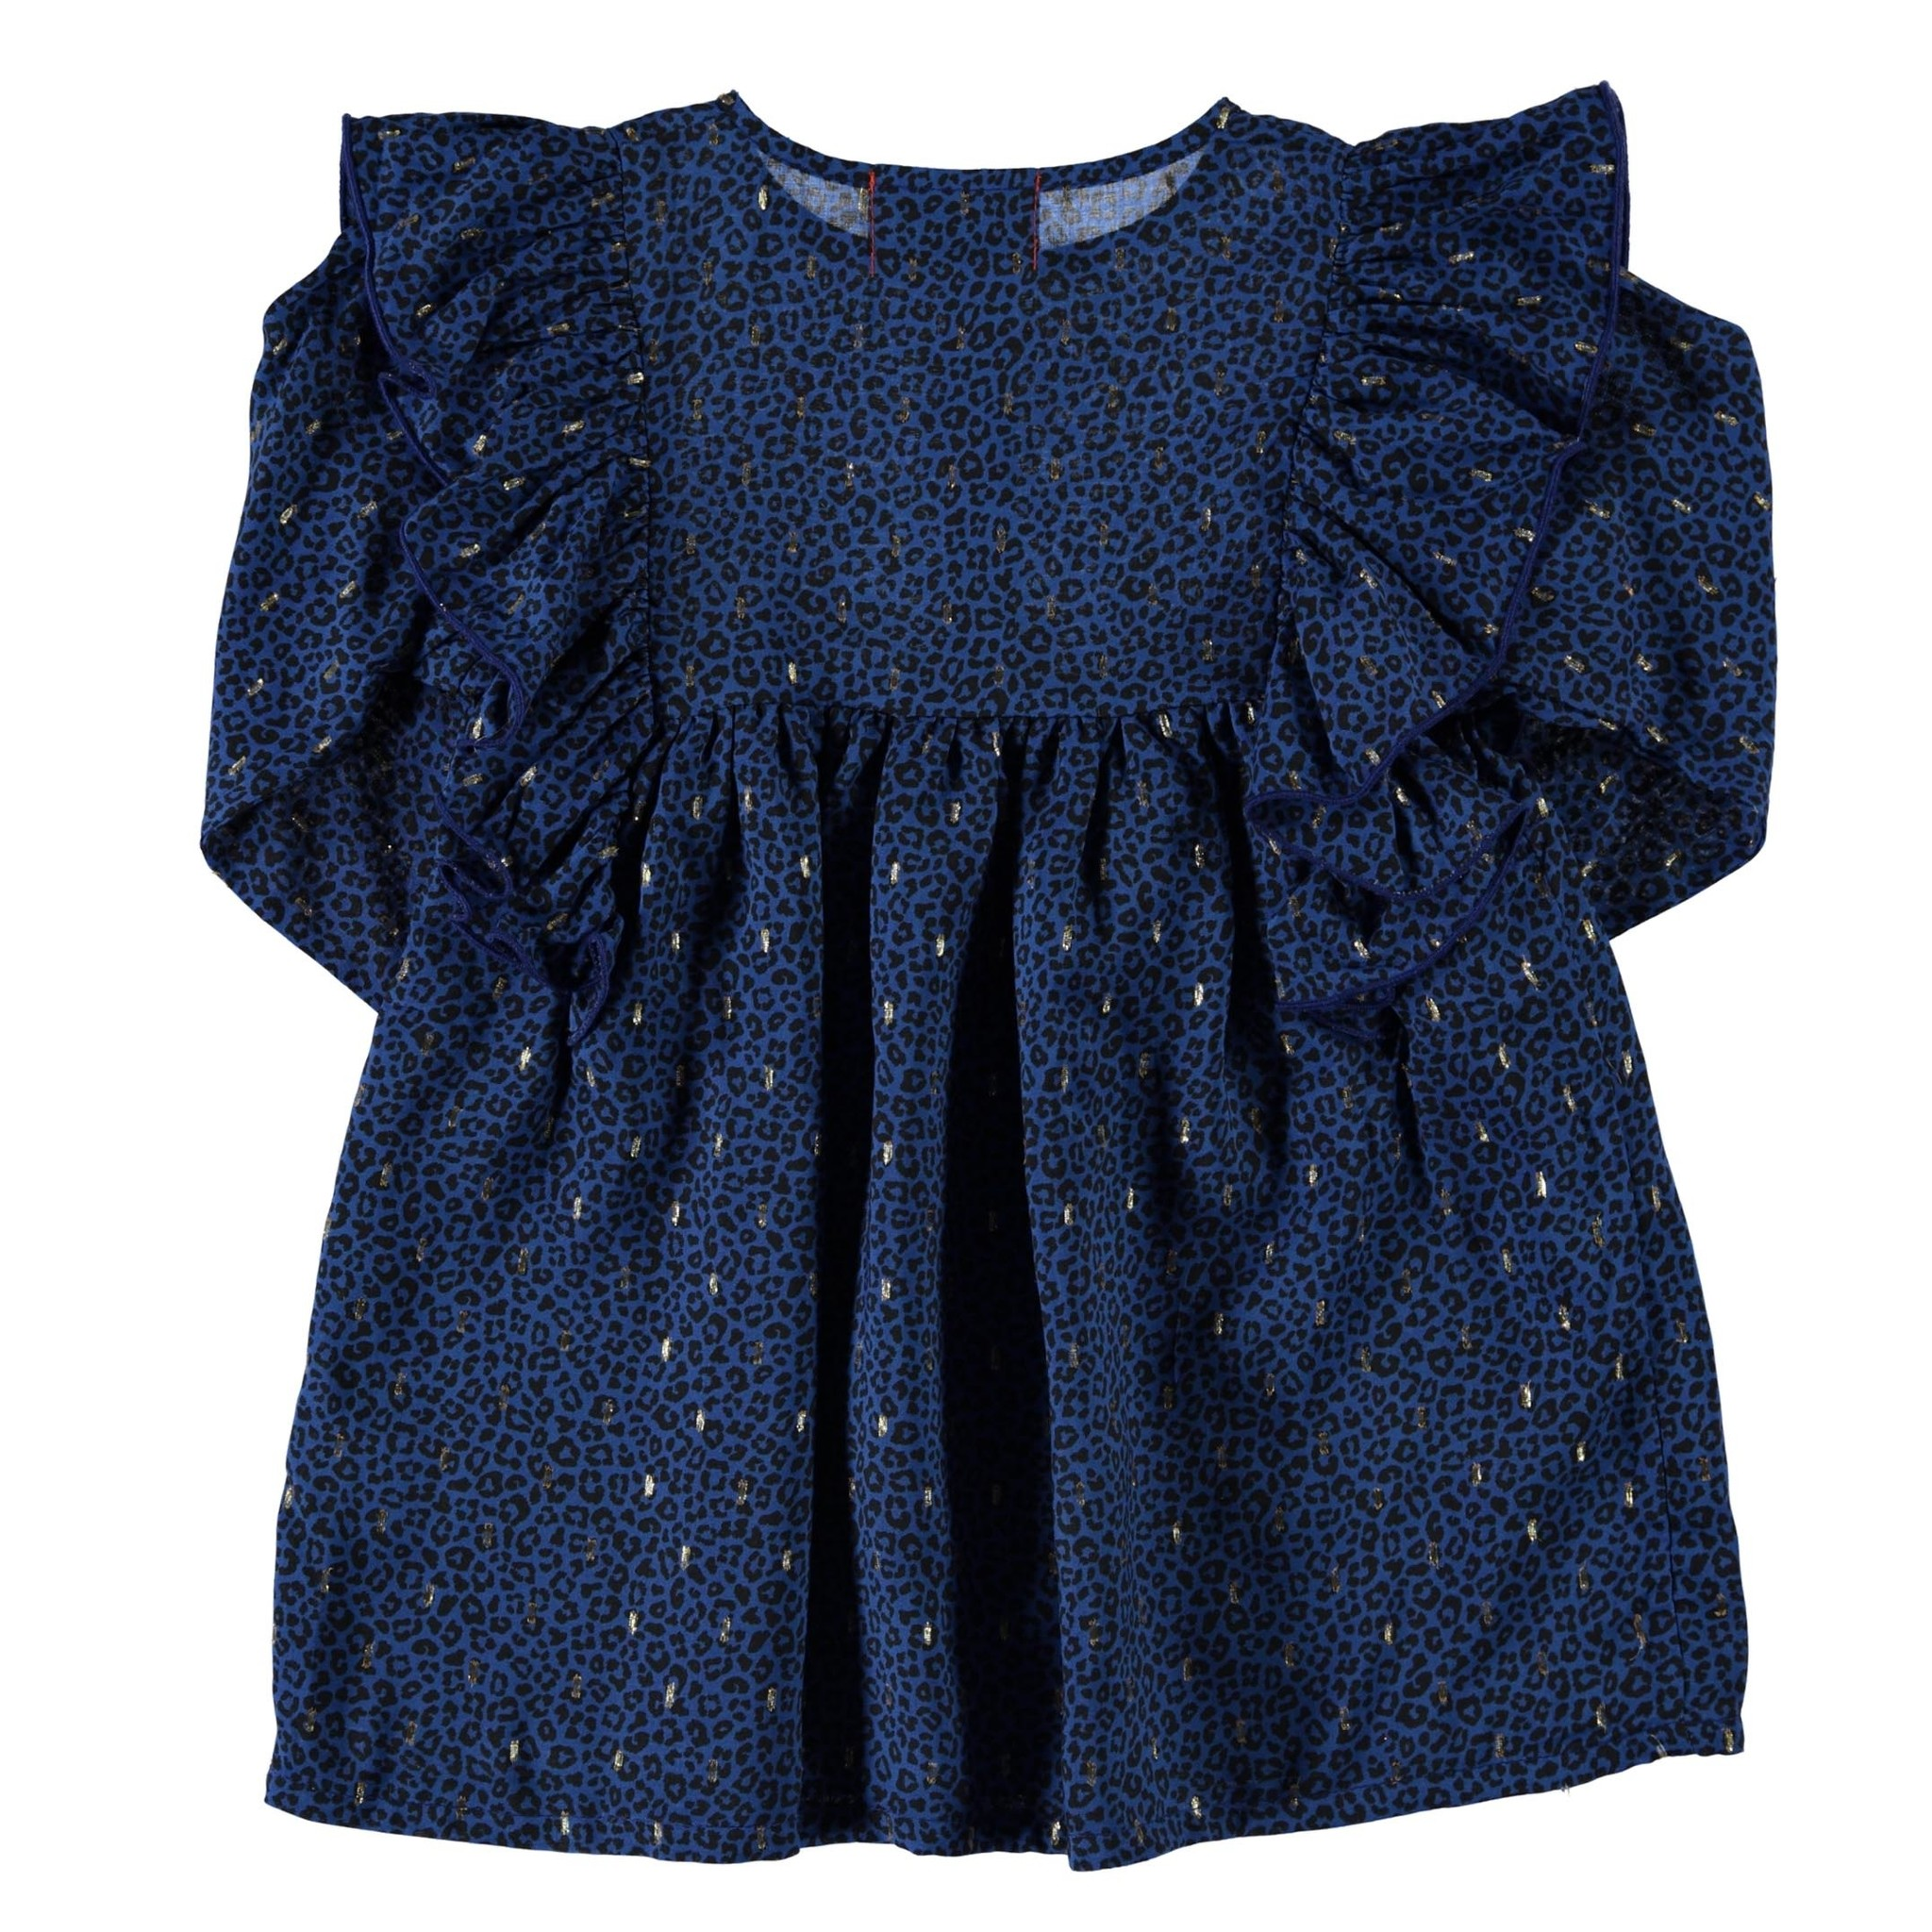 short dress w/ frills on shoulders | indigo animal print w/ golden lurex-2